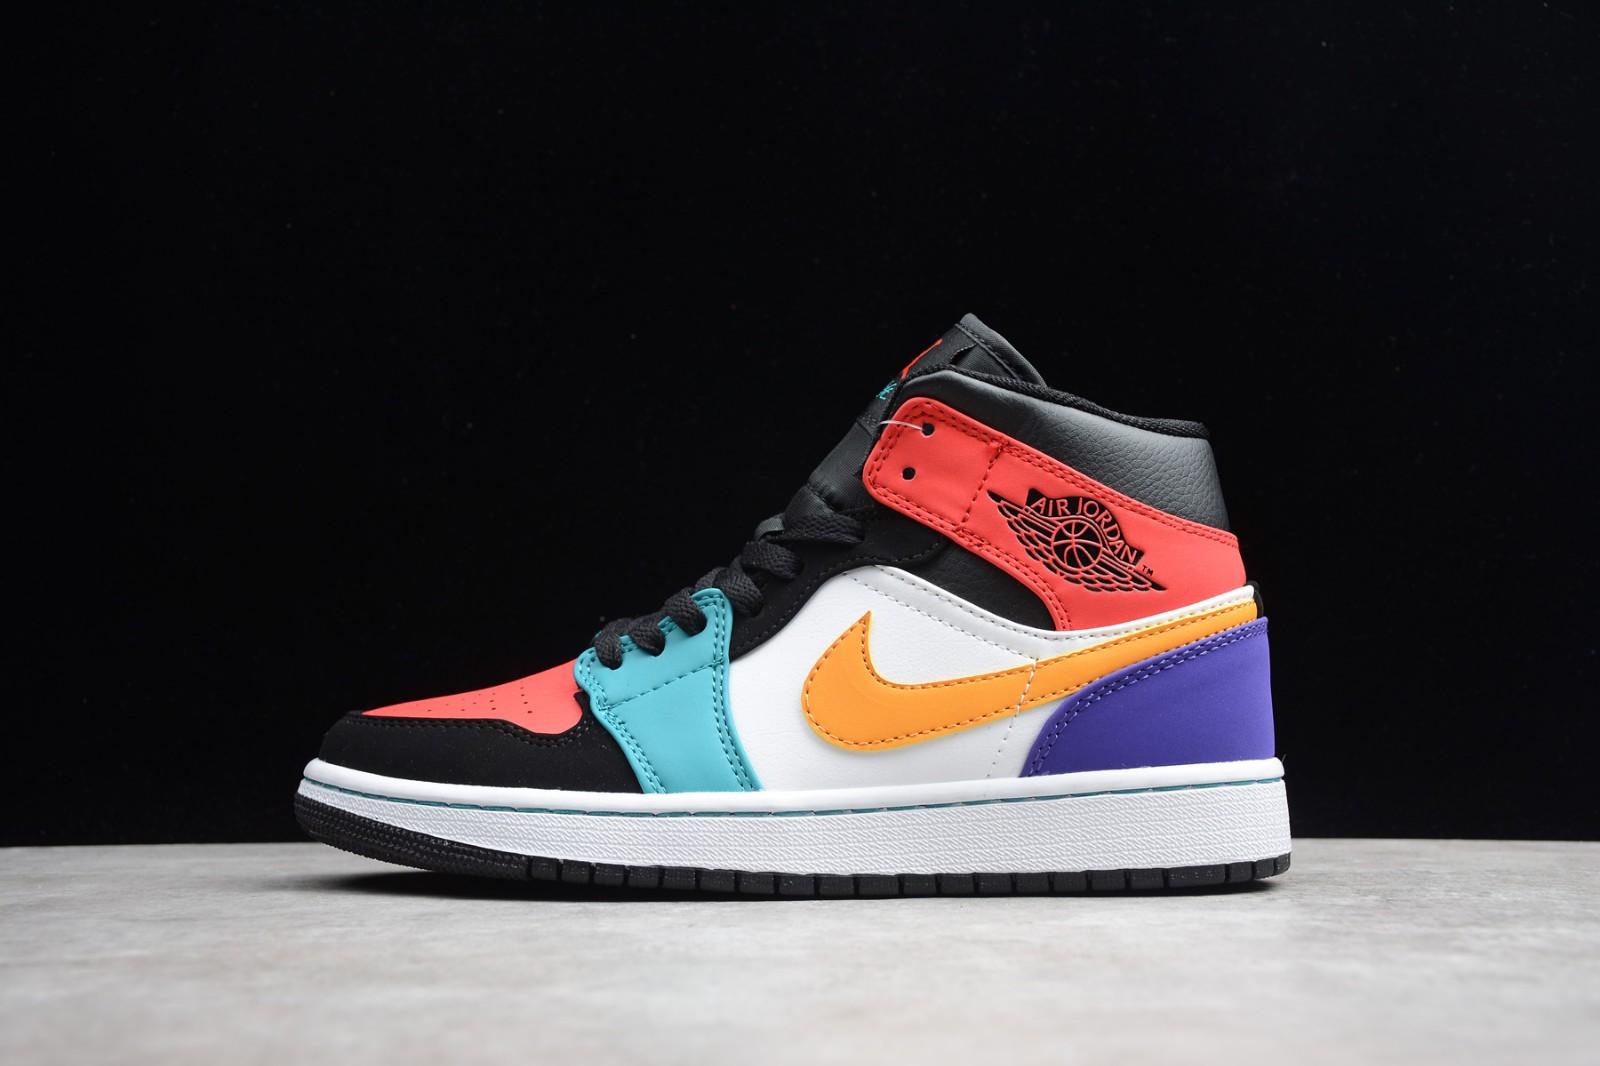 a5ec16fcee5736 Prev Nike Air Jordan 1 Mid Multi Color 554724-125. Zoom